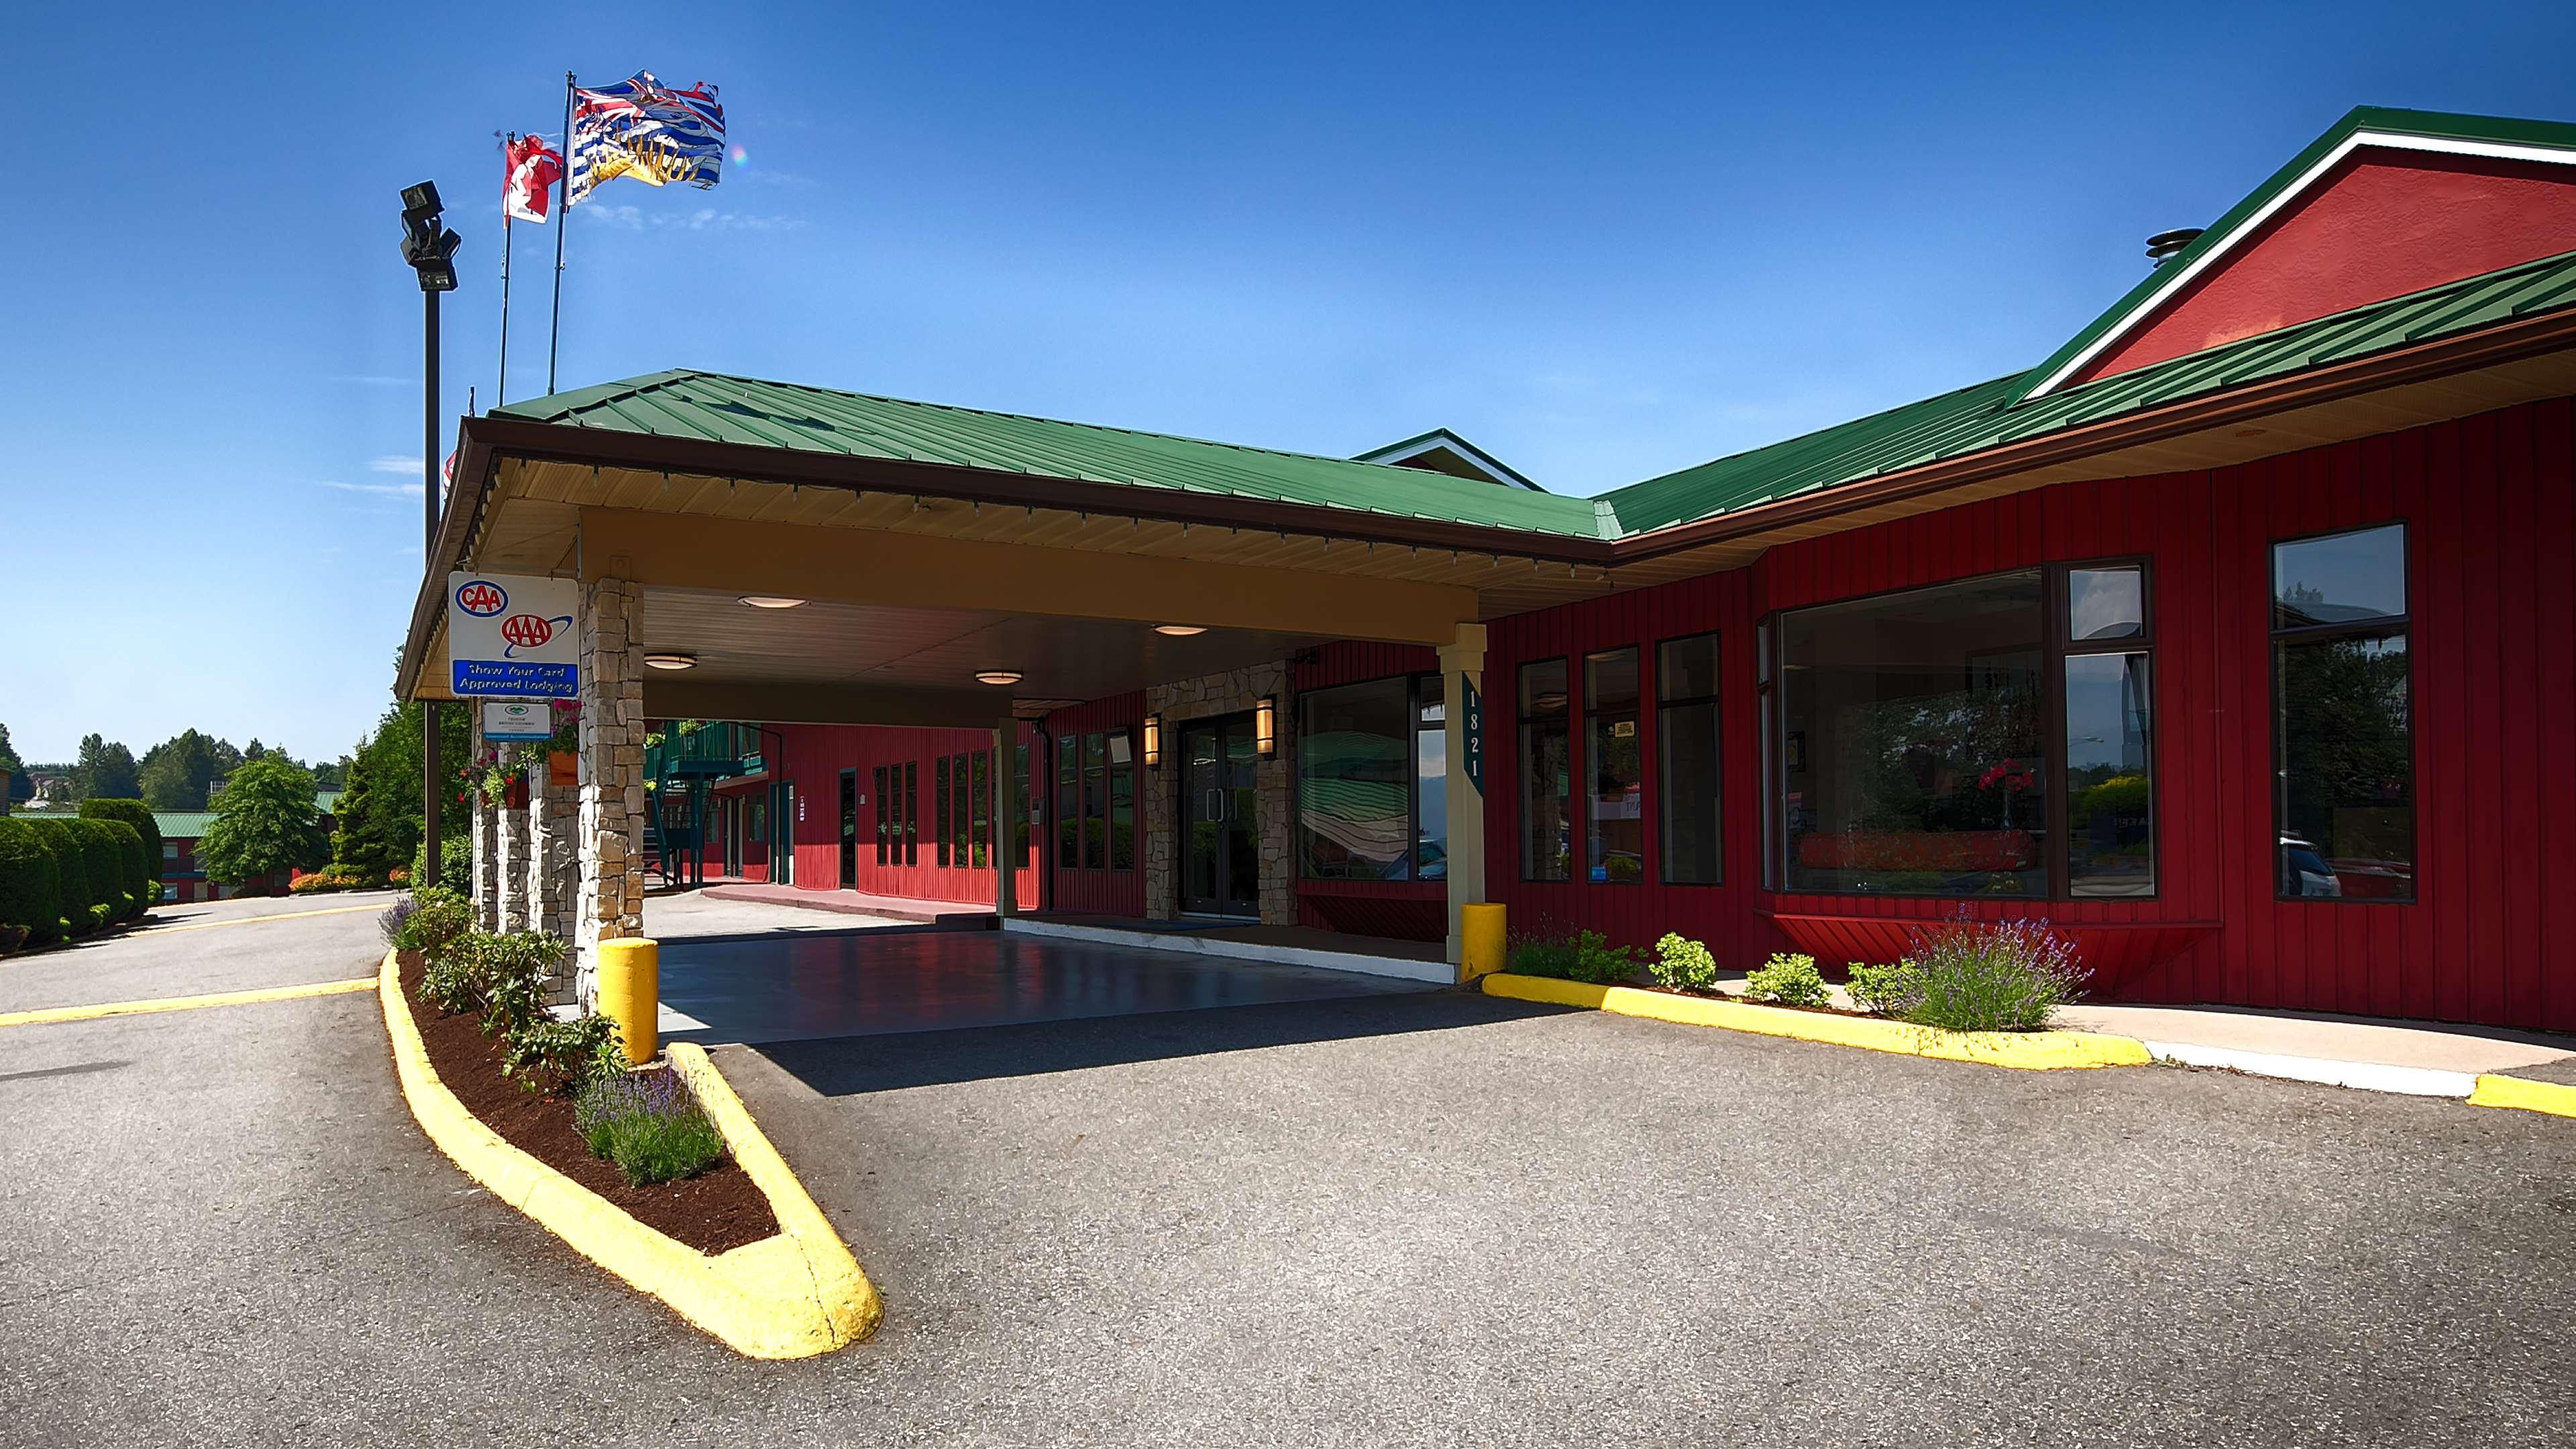 Best Western Bakerview Inn in Abbotsford: Best Western Bakerview Inn